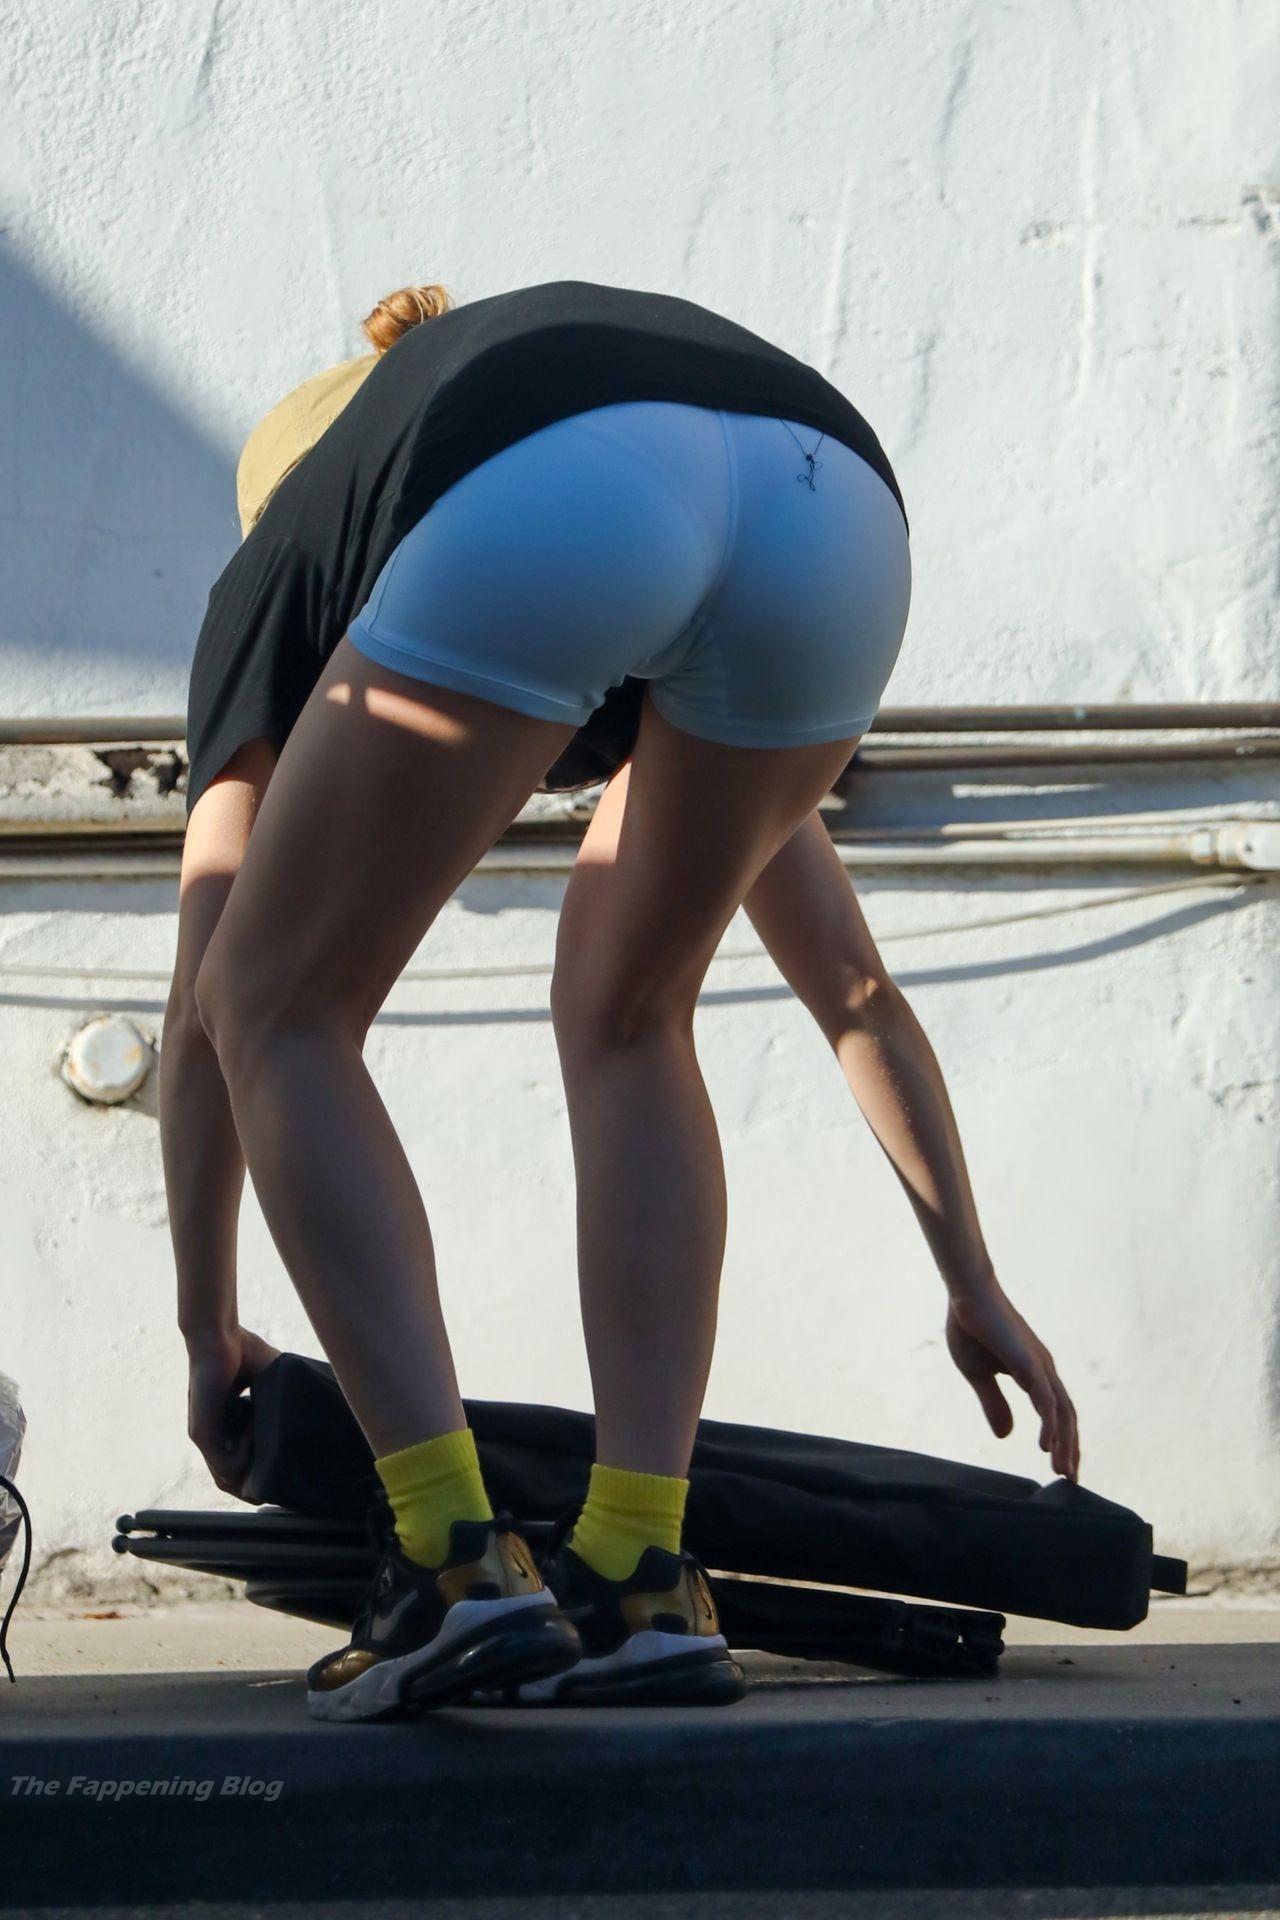 Suki-Waterhouse-Sexy-The-Fappening-Blog-19.jpg